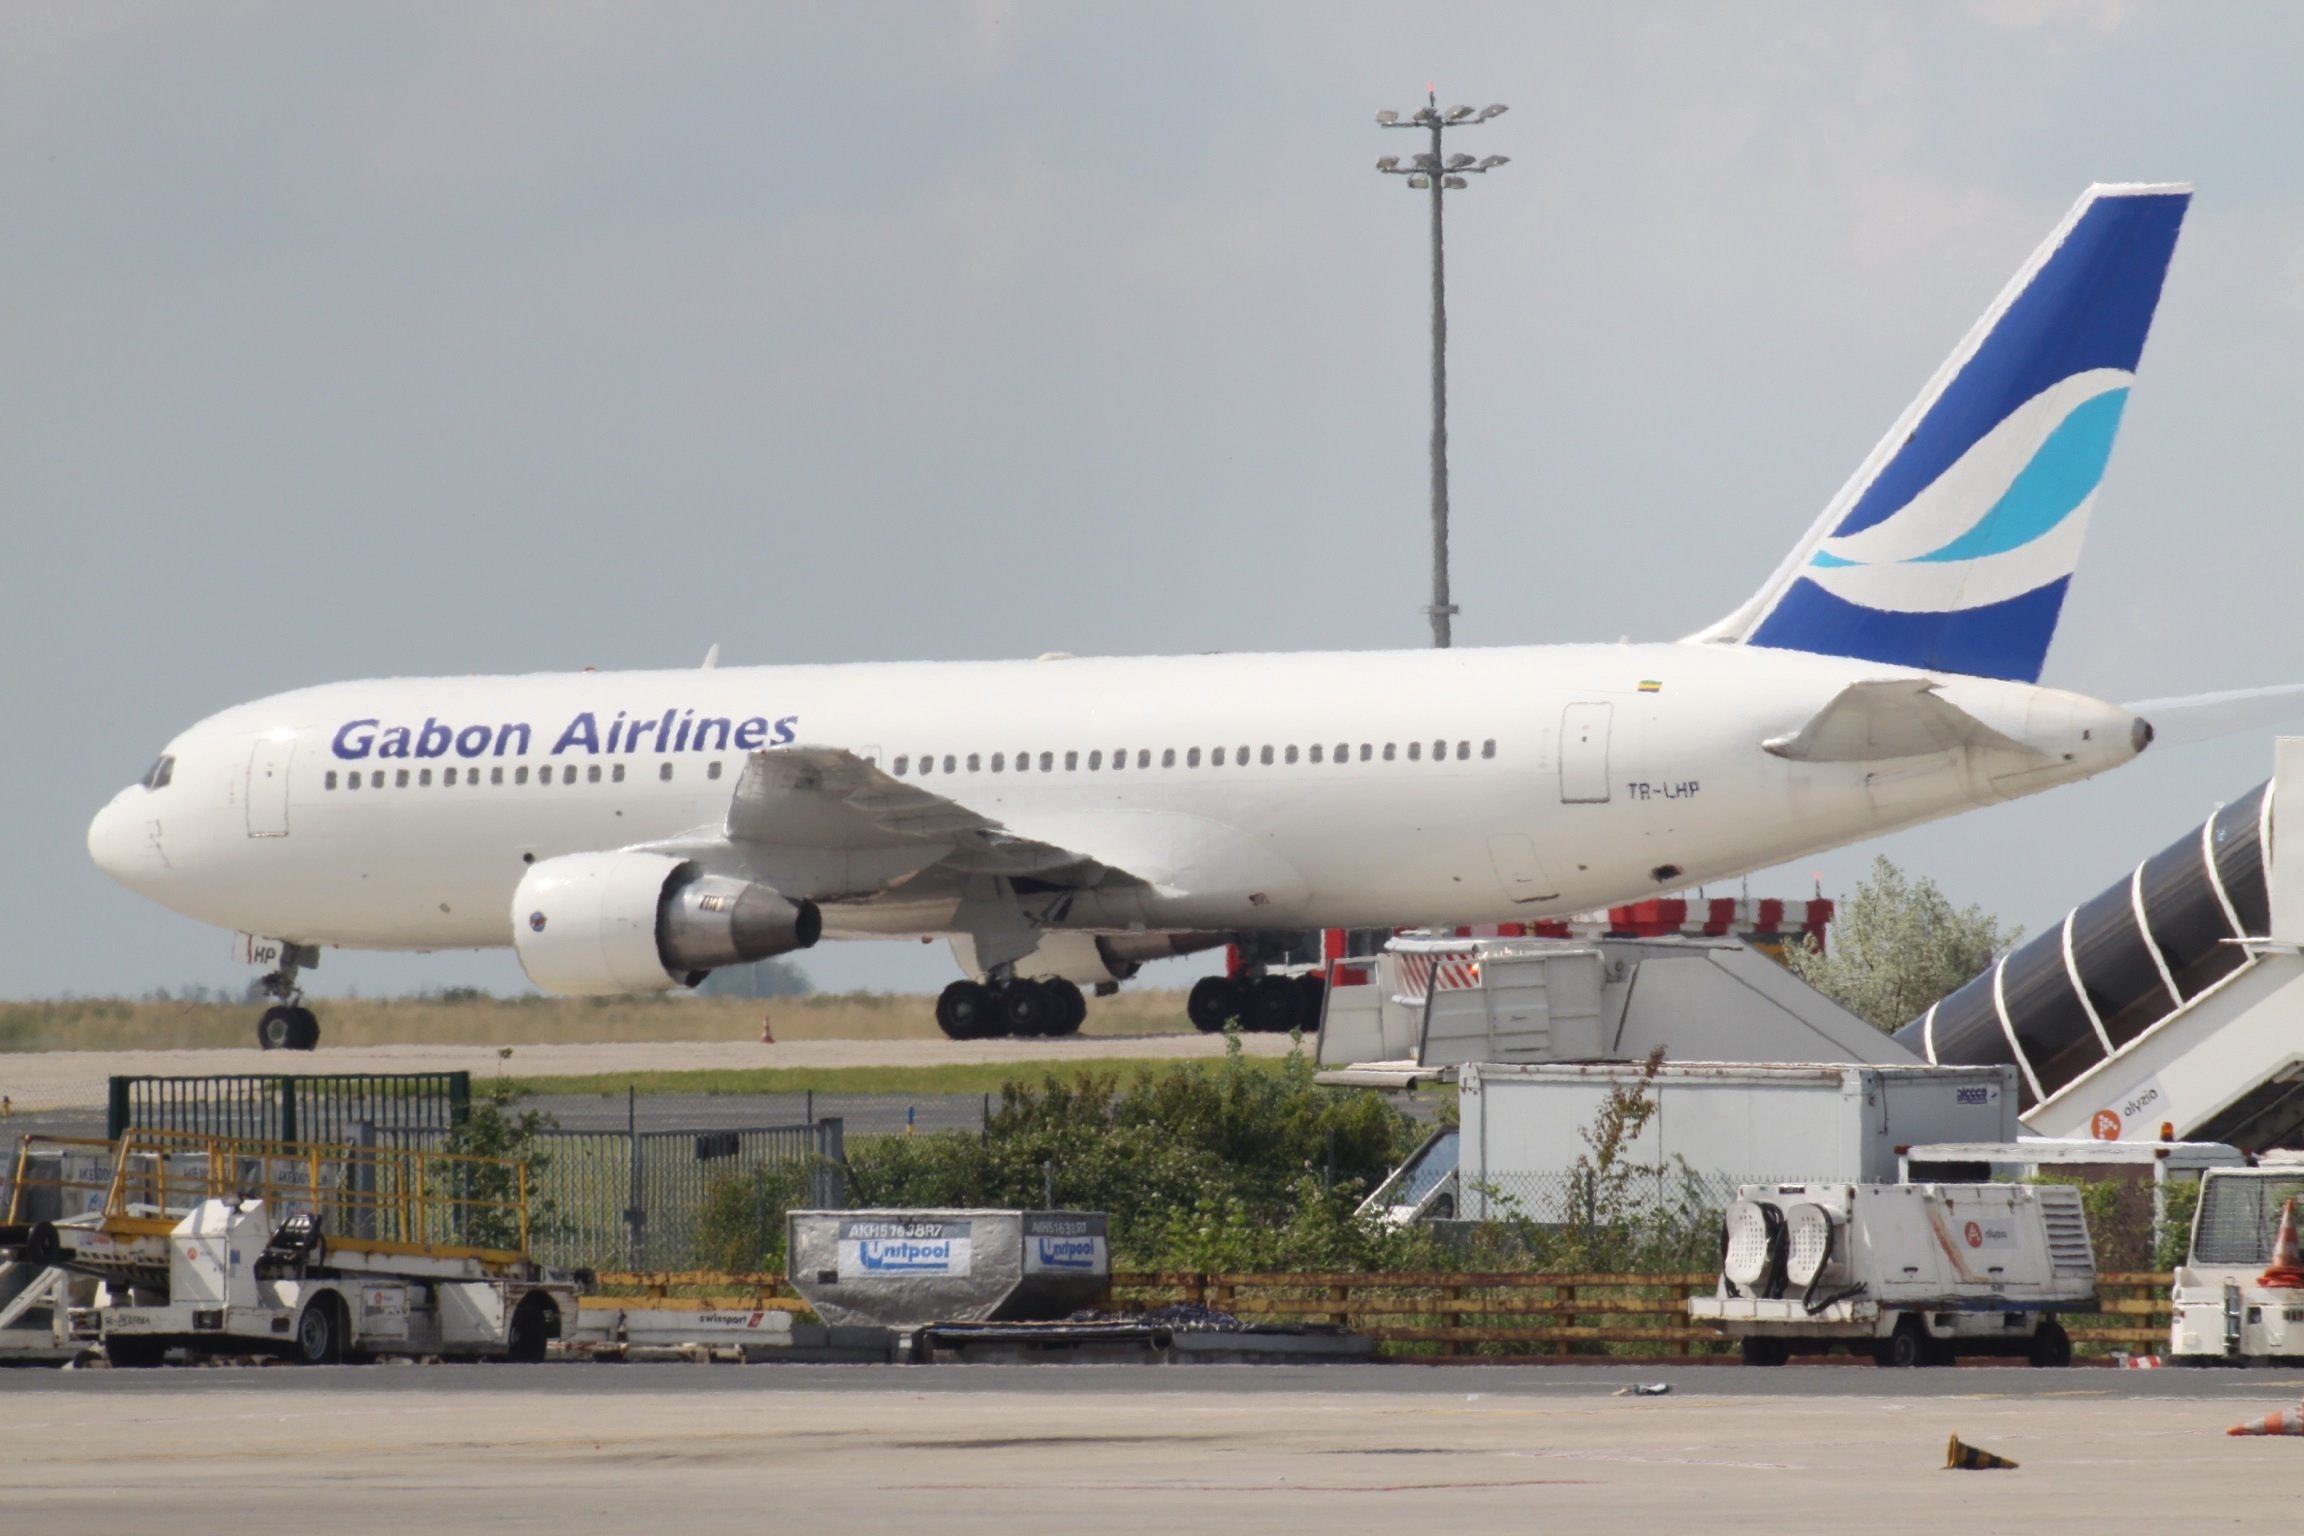 Boeing 767 fra Gabon Airlines. (Foto: Aeroprints.com | CC 3.0)